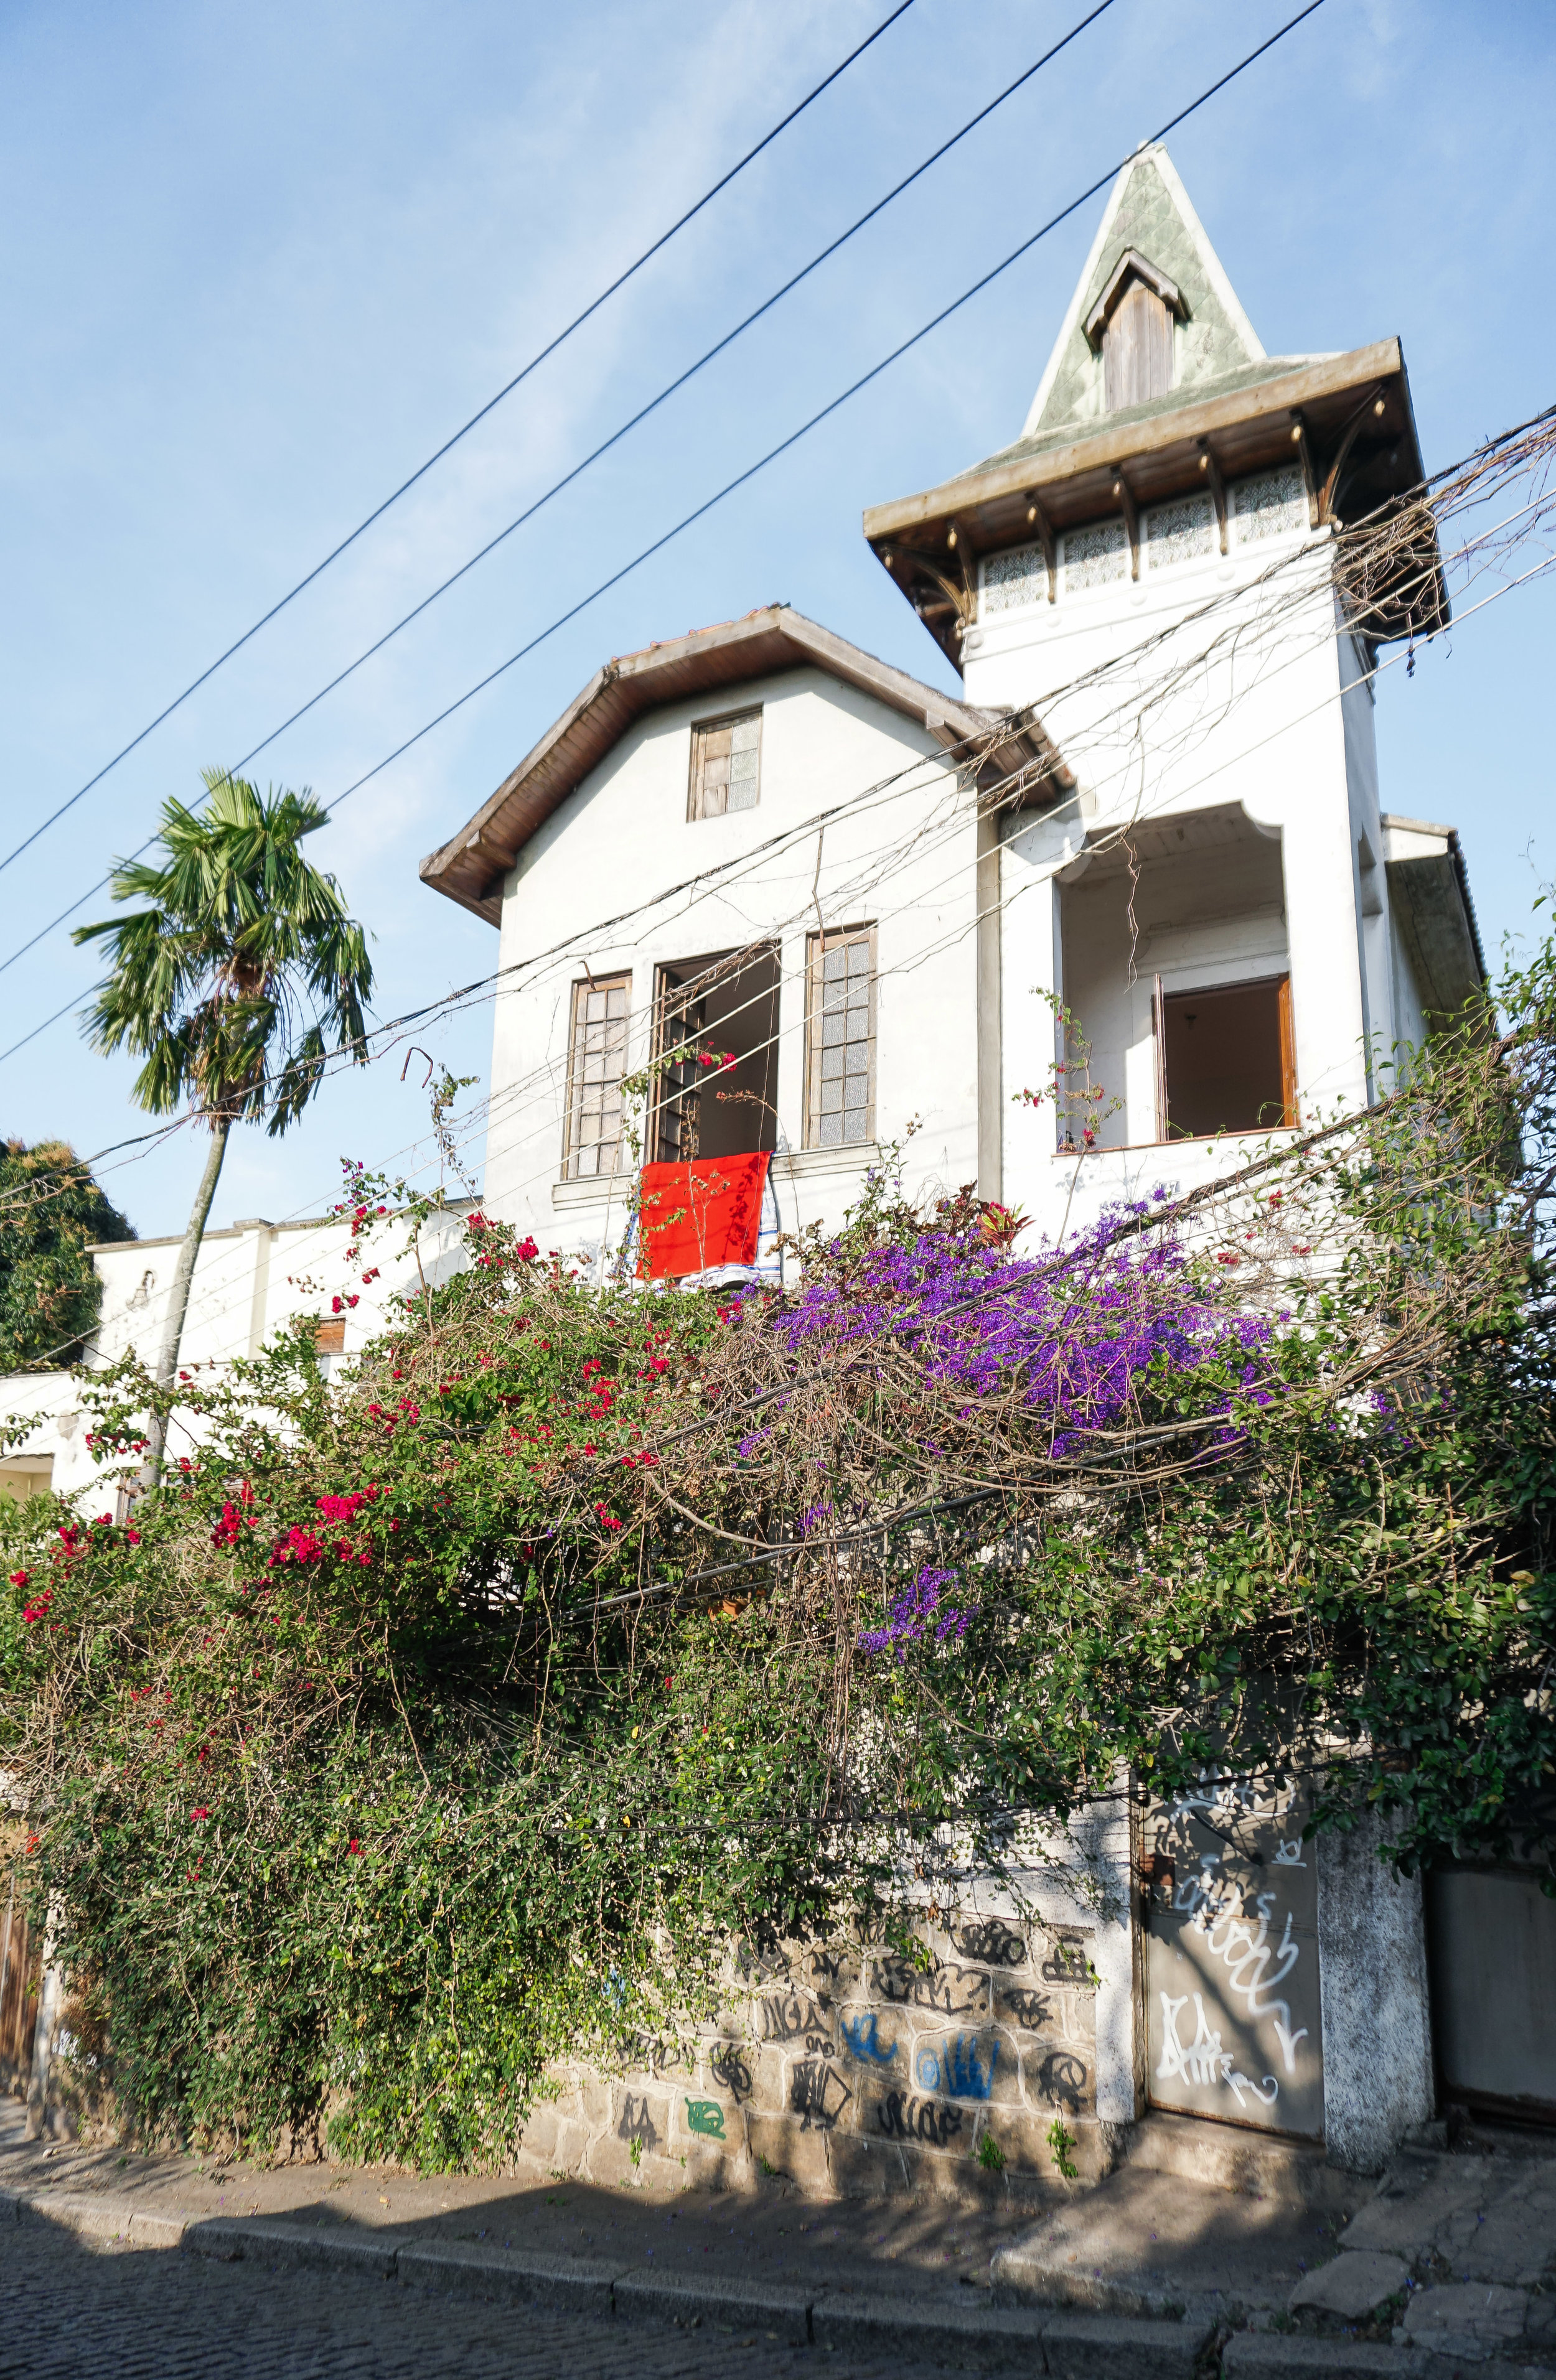 curio.trips.brazil.rio.de.janeiro.white.house.palmtree.portrait.jpg